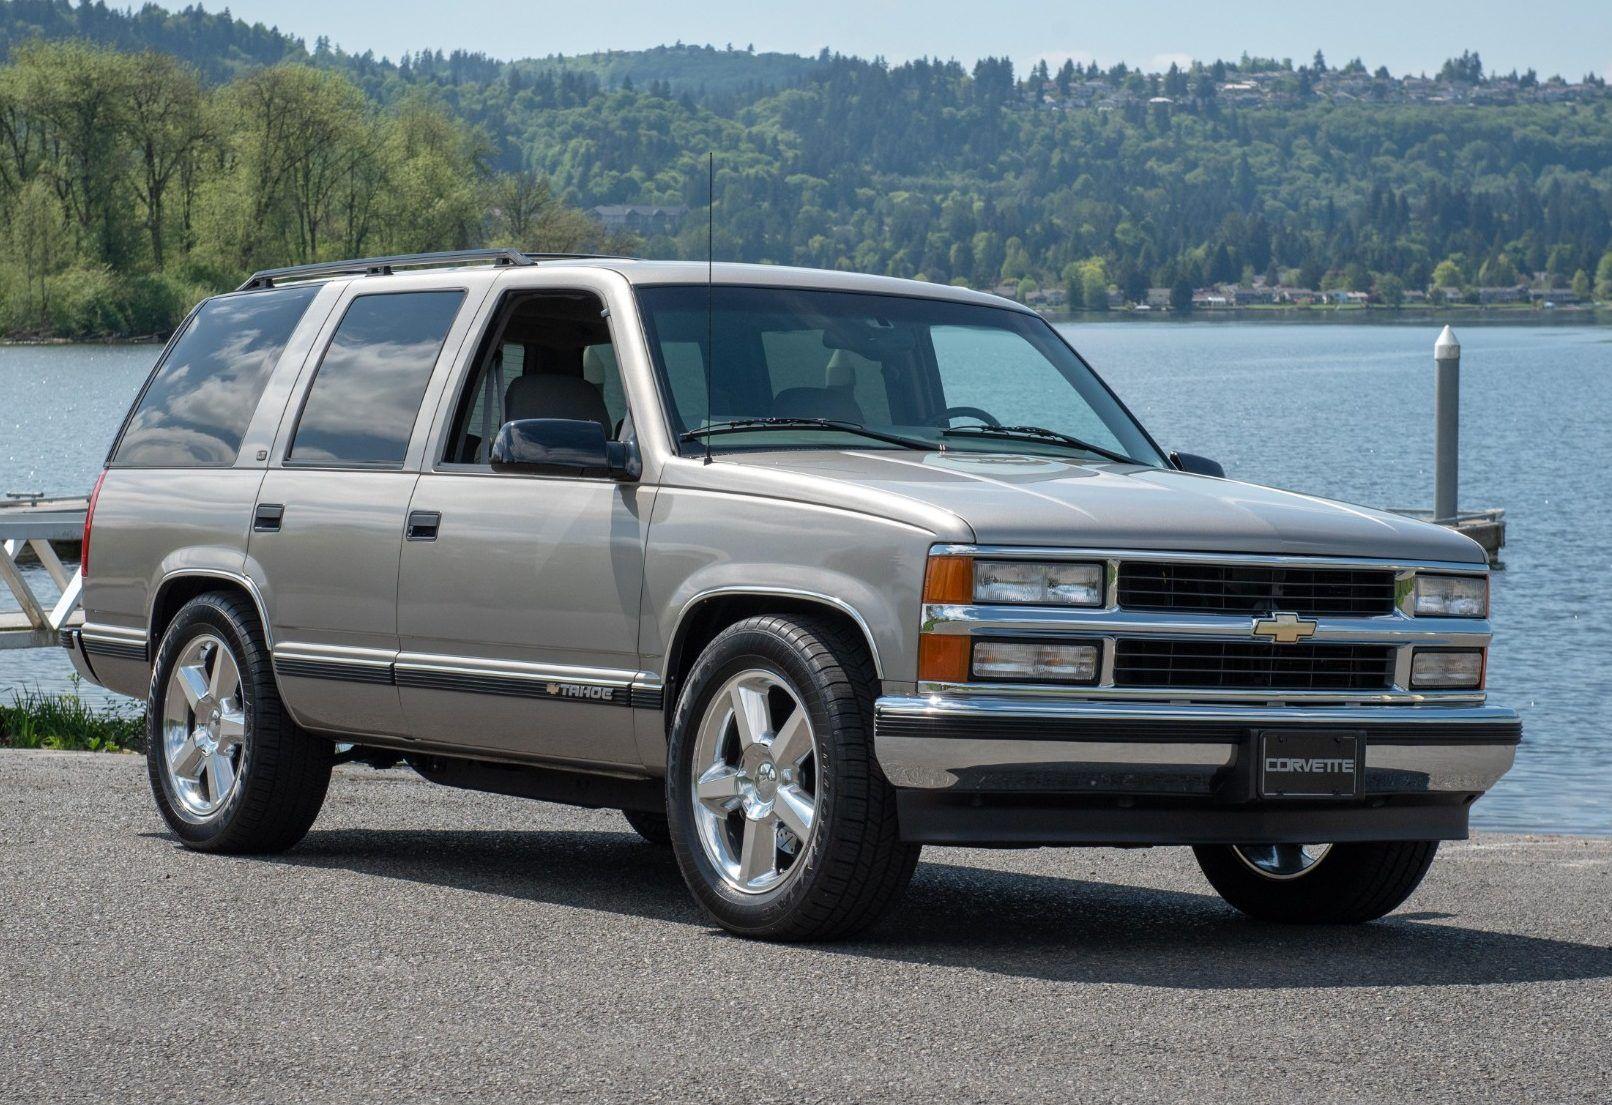 Ls9 Powered 1998 Chevrolet Tahoe Chevy Tahoe Chevrolet Tahoe Chevrolet